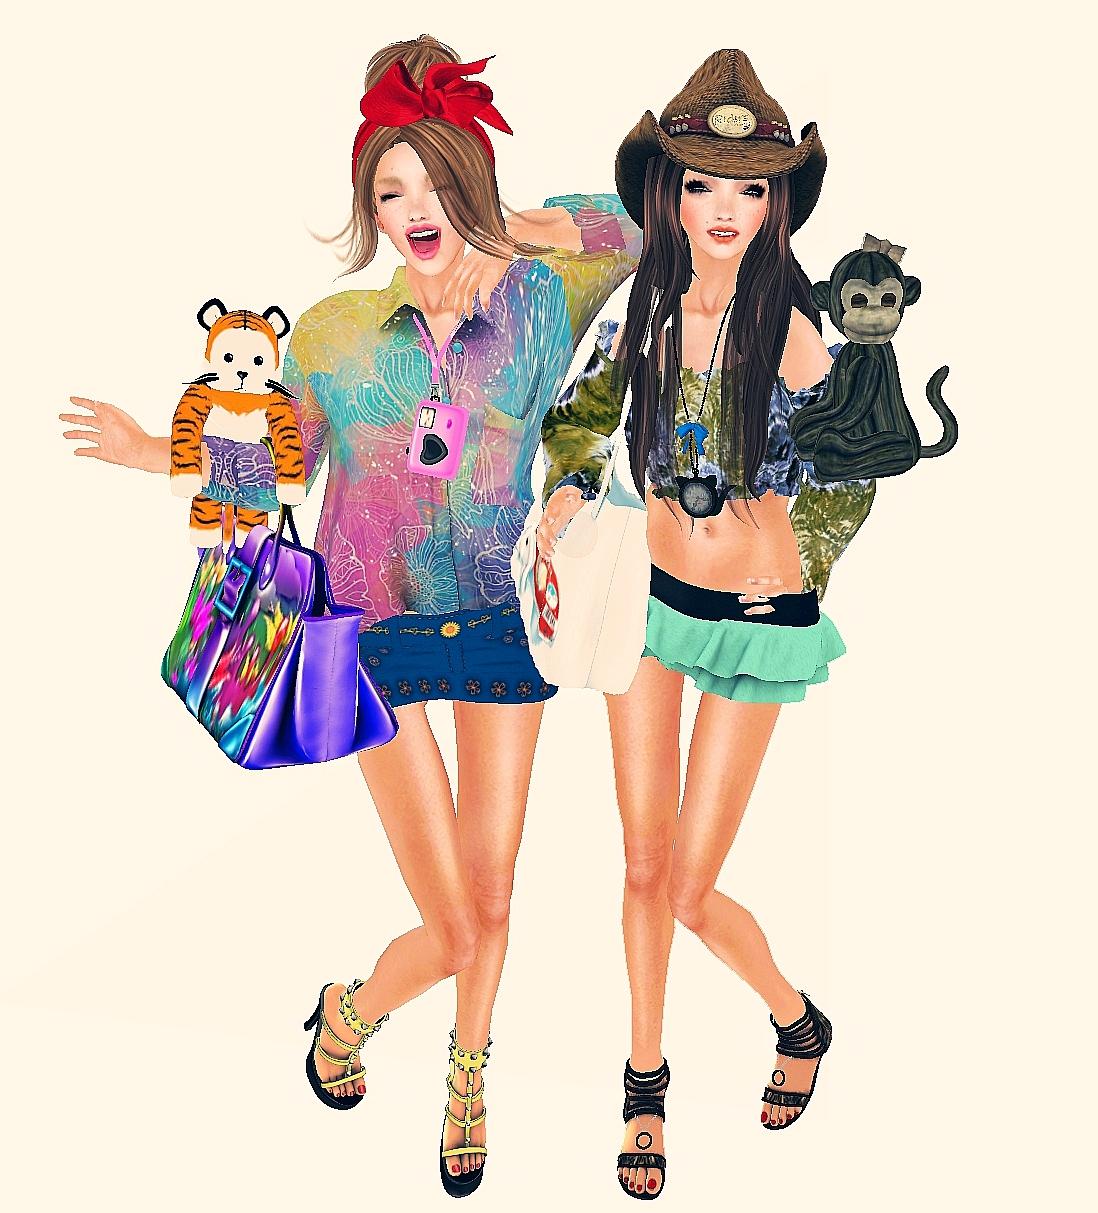 1c17fd1ec5e60 Top  The Plastik - Kalina (Taste Of Rainbow Hunt) Skirt   Epic Style -  miniskirt (Season s Palette Hunt) Shoes   Gabriel - MESH   Studs Yellow  Sandals ...